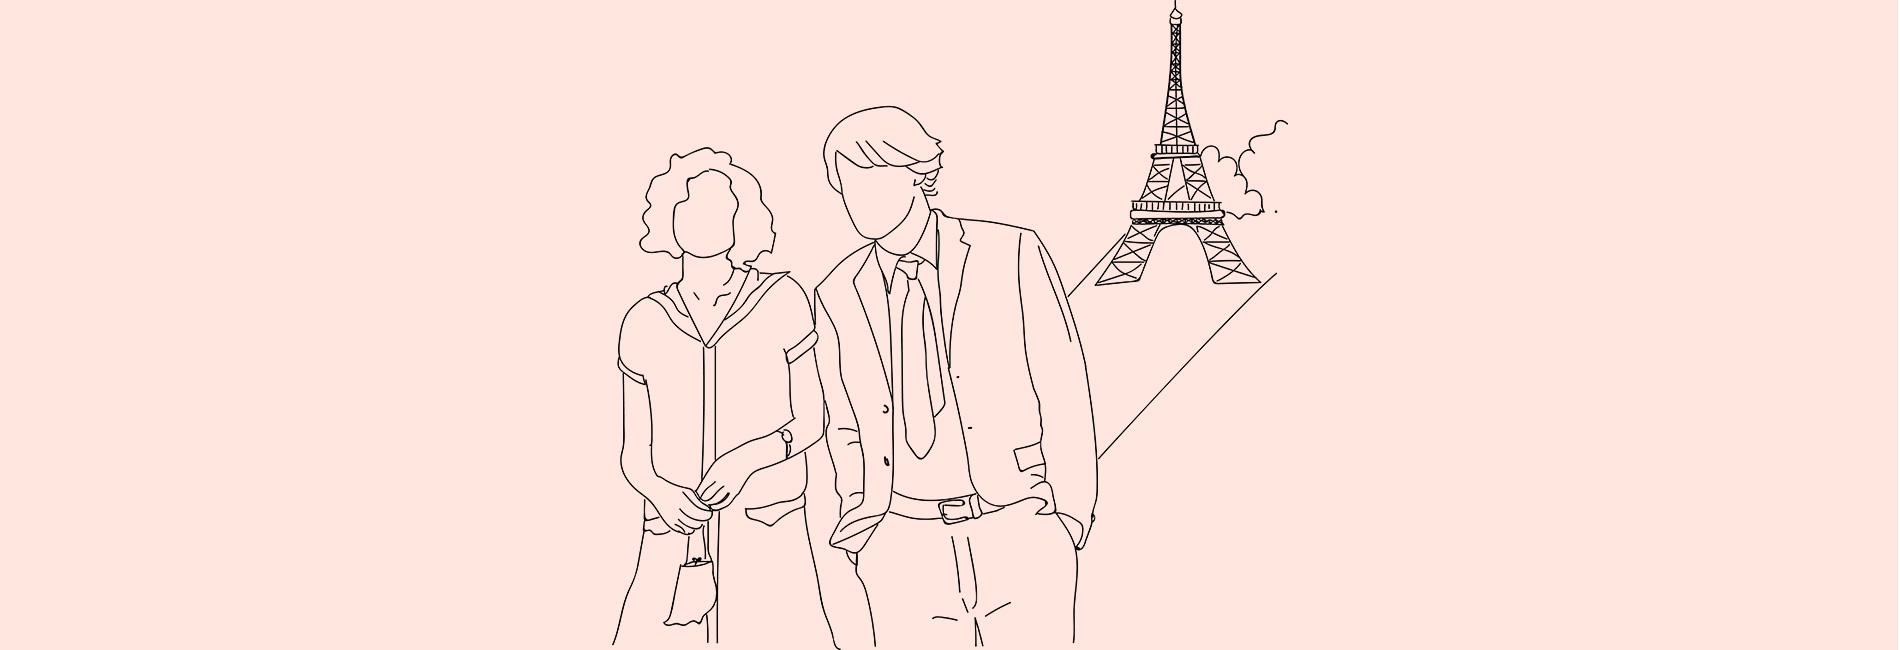 Top 10 comedias románticas francesas del siglo XXI